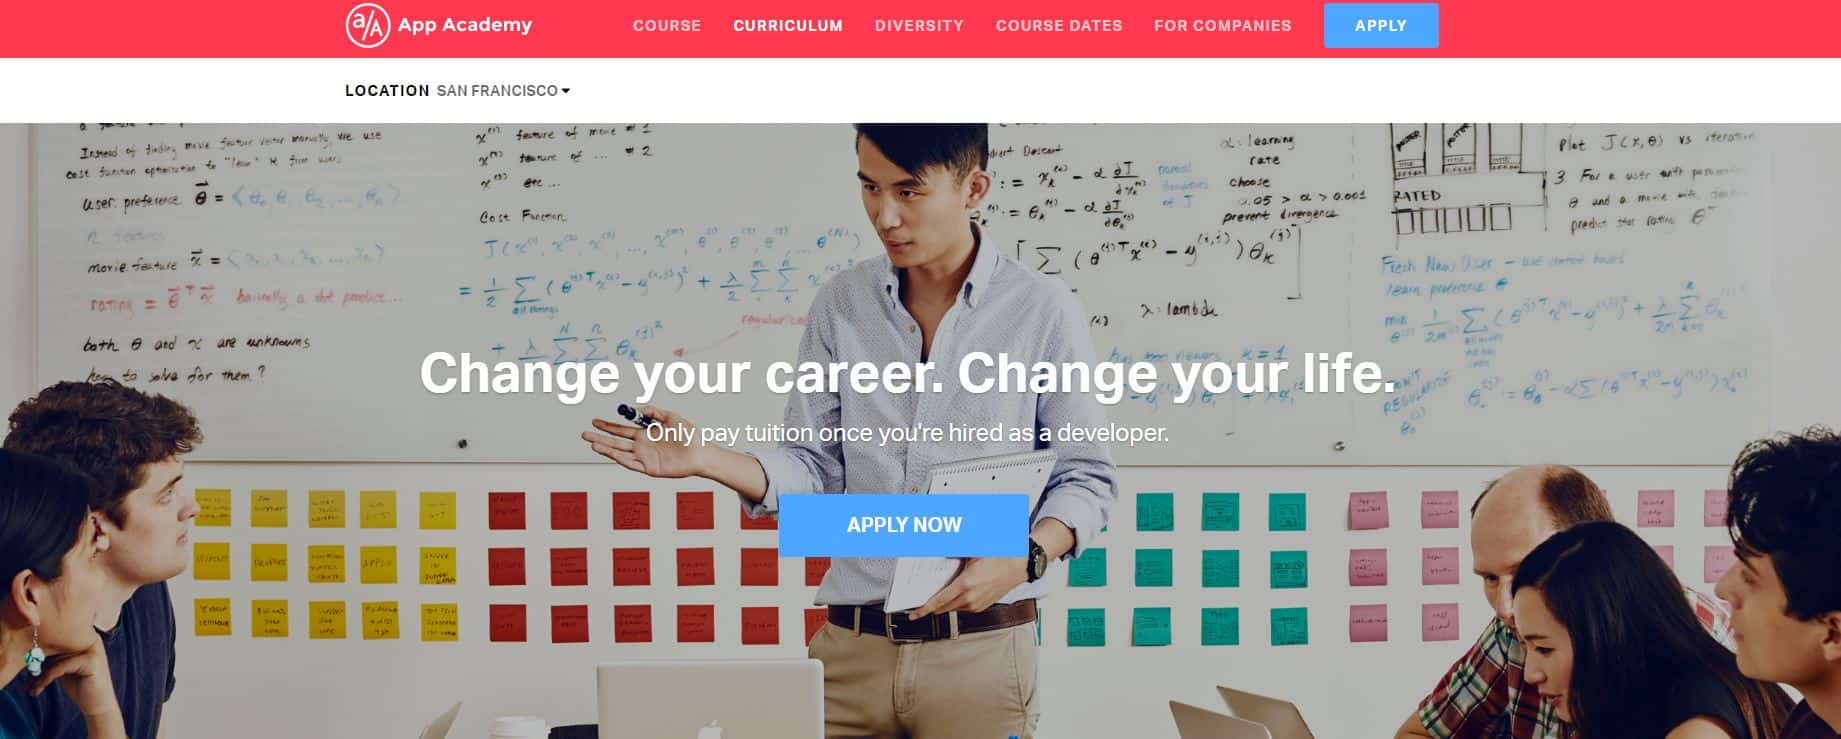 App Academy NYC